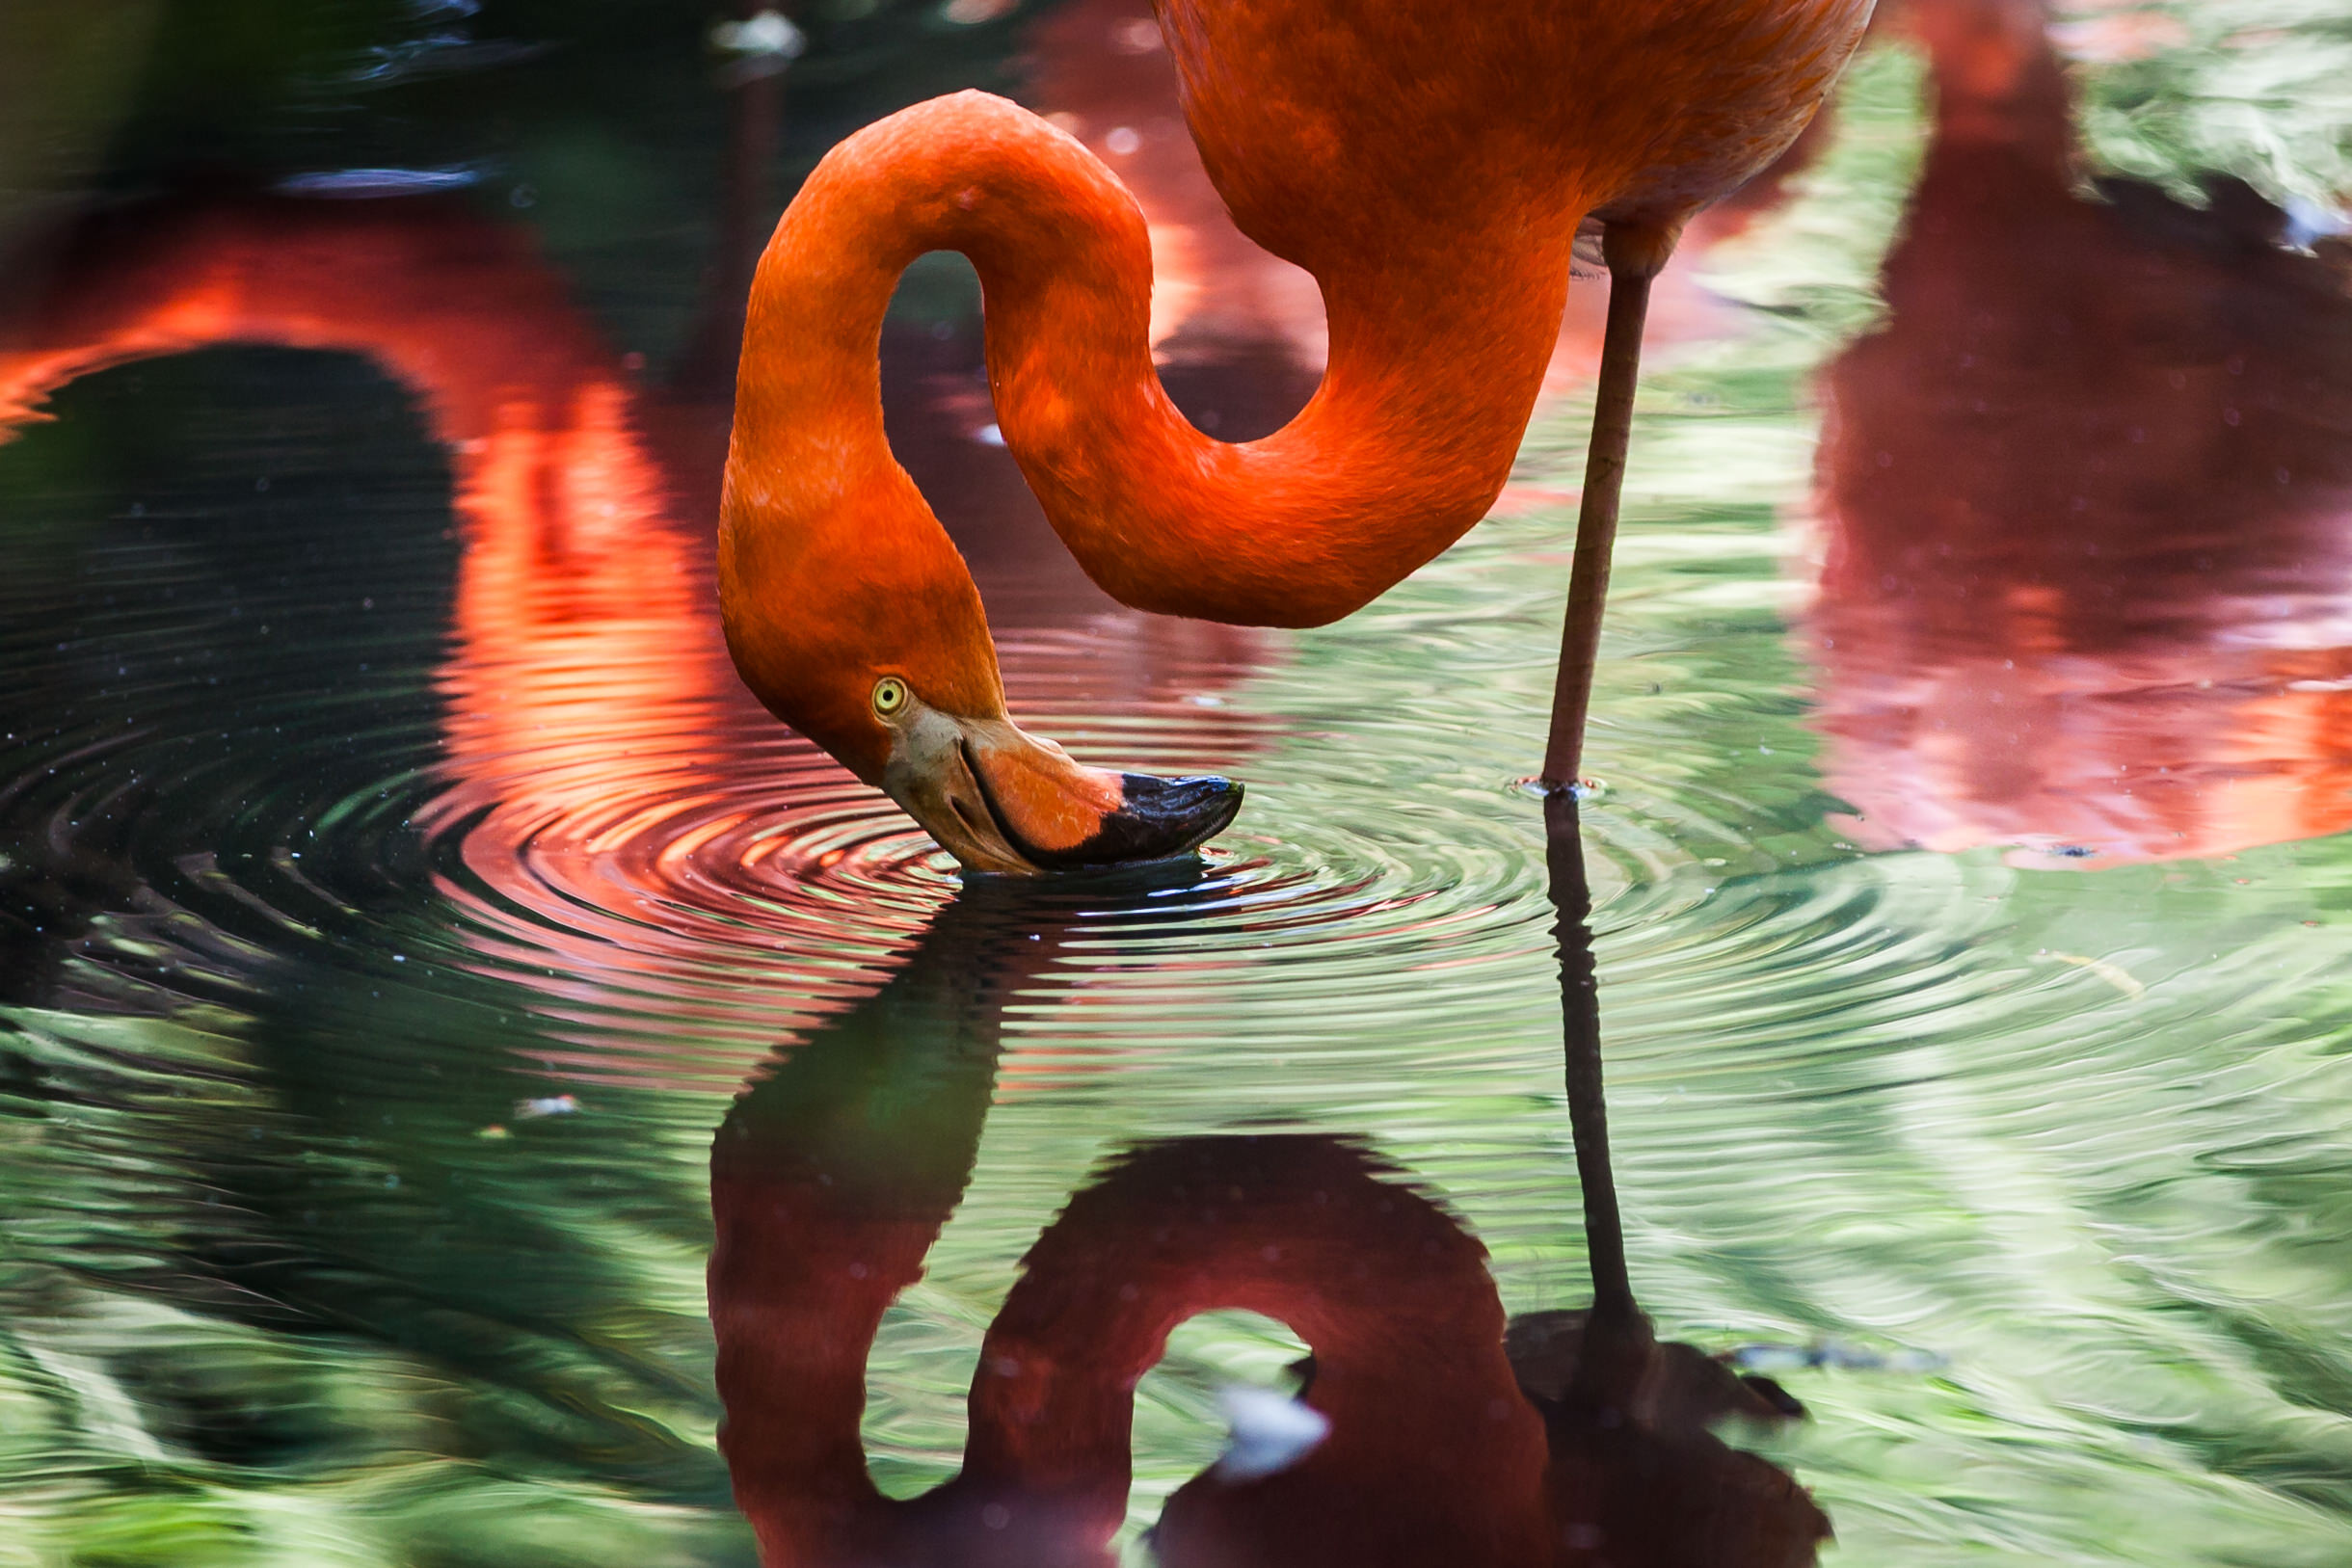 Rio Reflections... (Image credit: Unsplash)